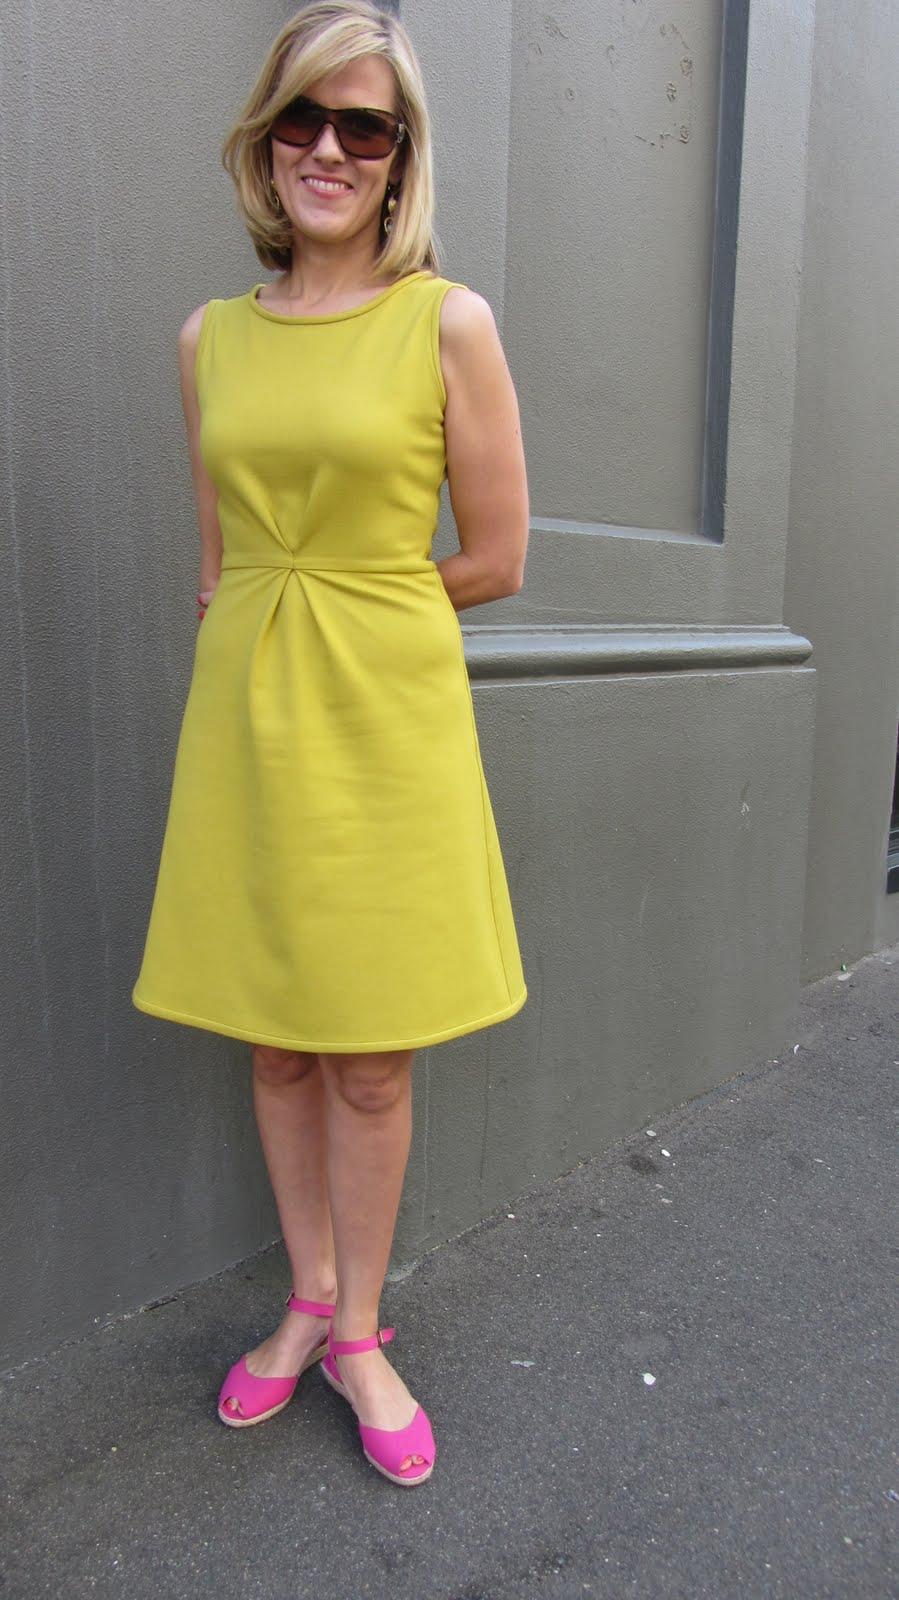 Simple Knit Fabric Dress Pattern: Girls a line pullover dress free ...